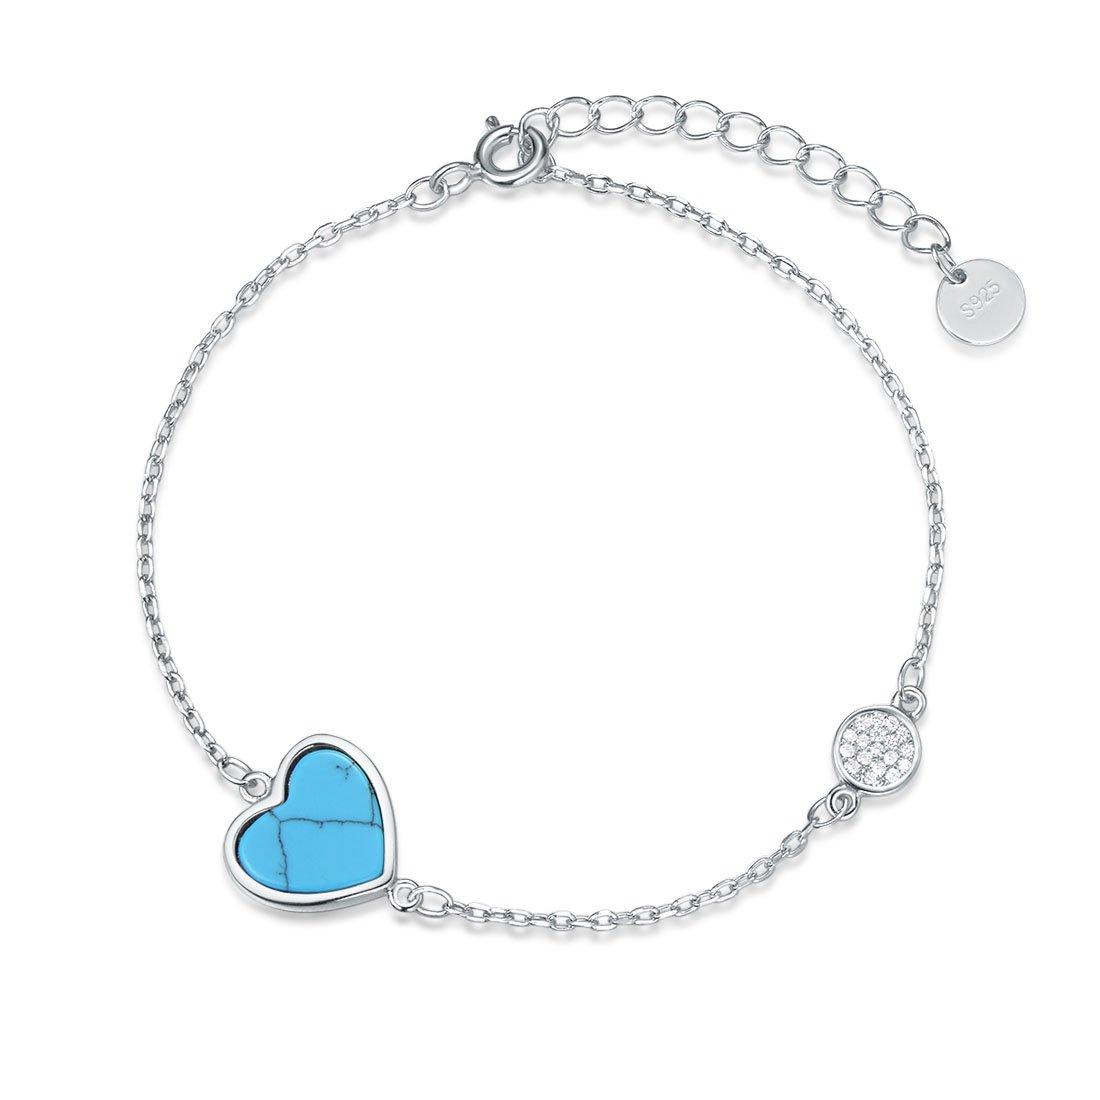 Agvana Sterling Silver Blue Heart Bracelets Cubic Zirconia CZ Created Turquoise Dainty Bracelet Gift for Women Girls 6.3''+ 1.4''